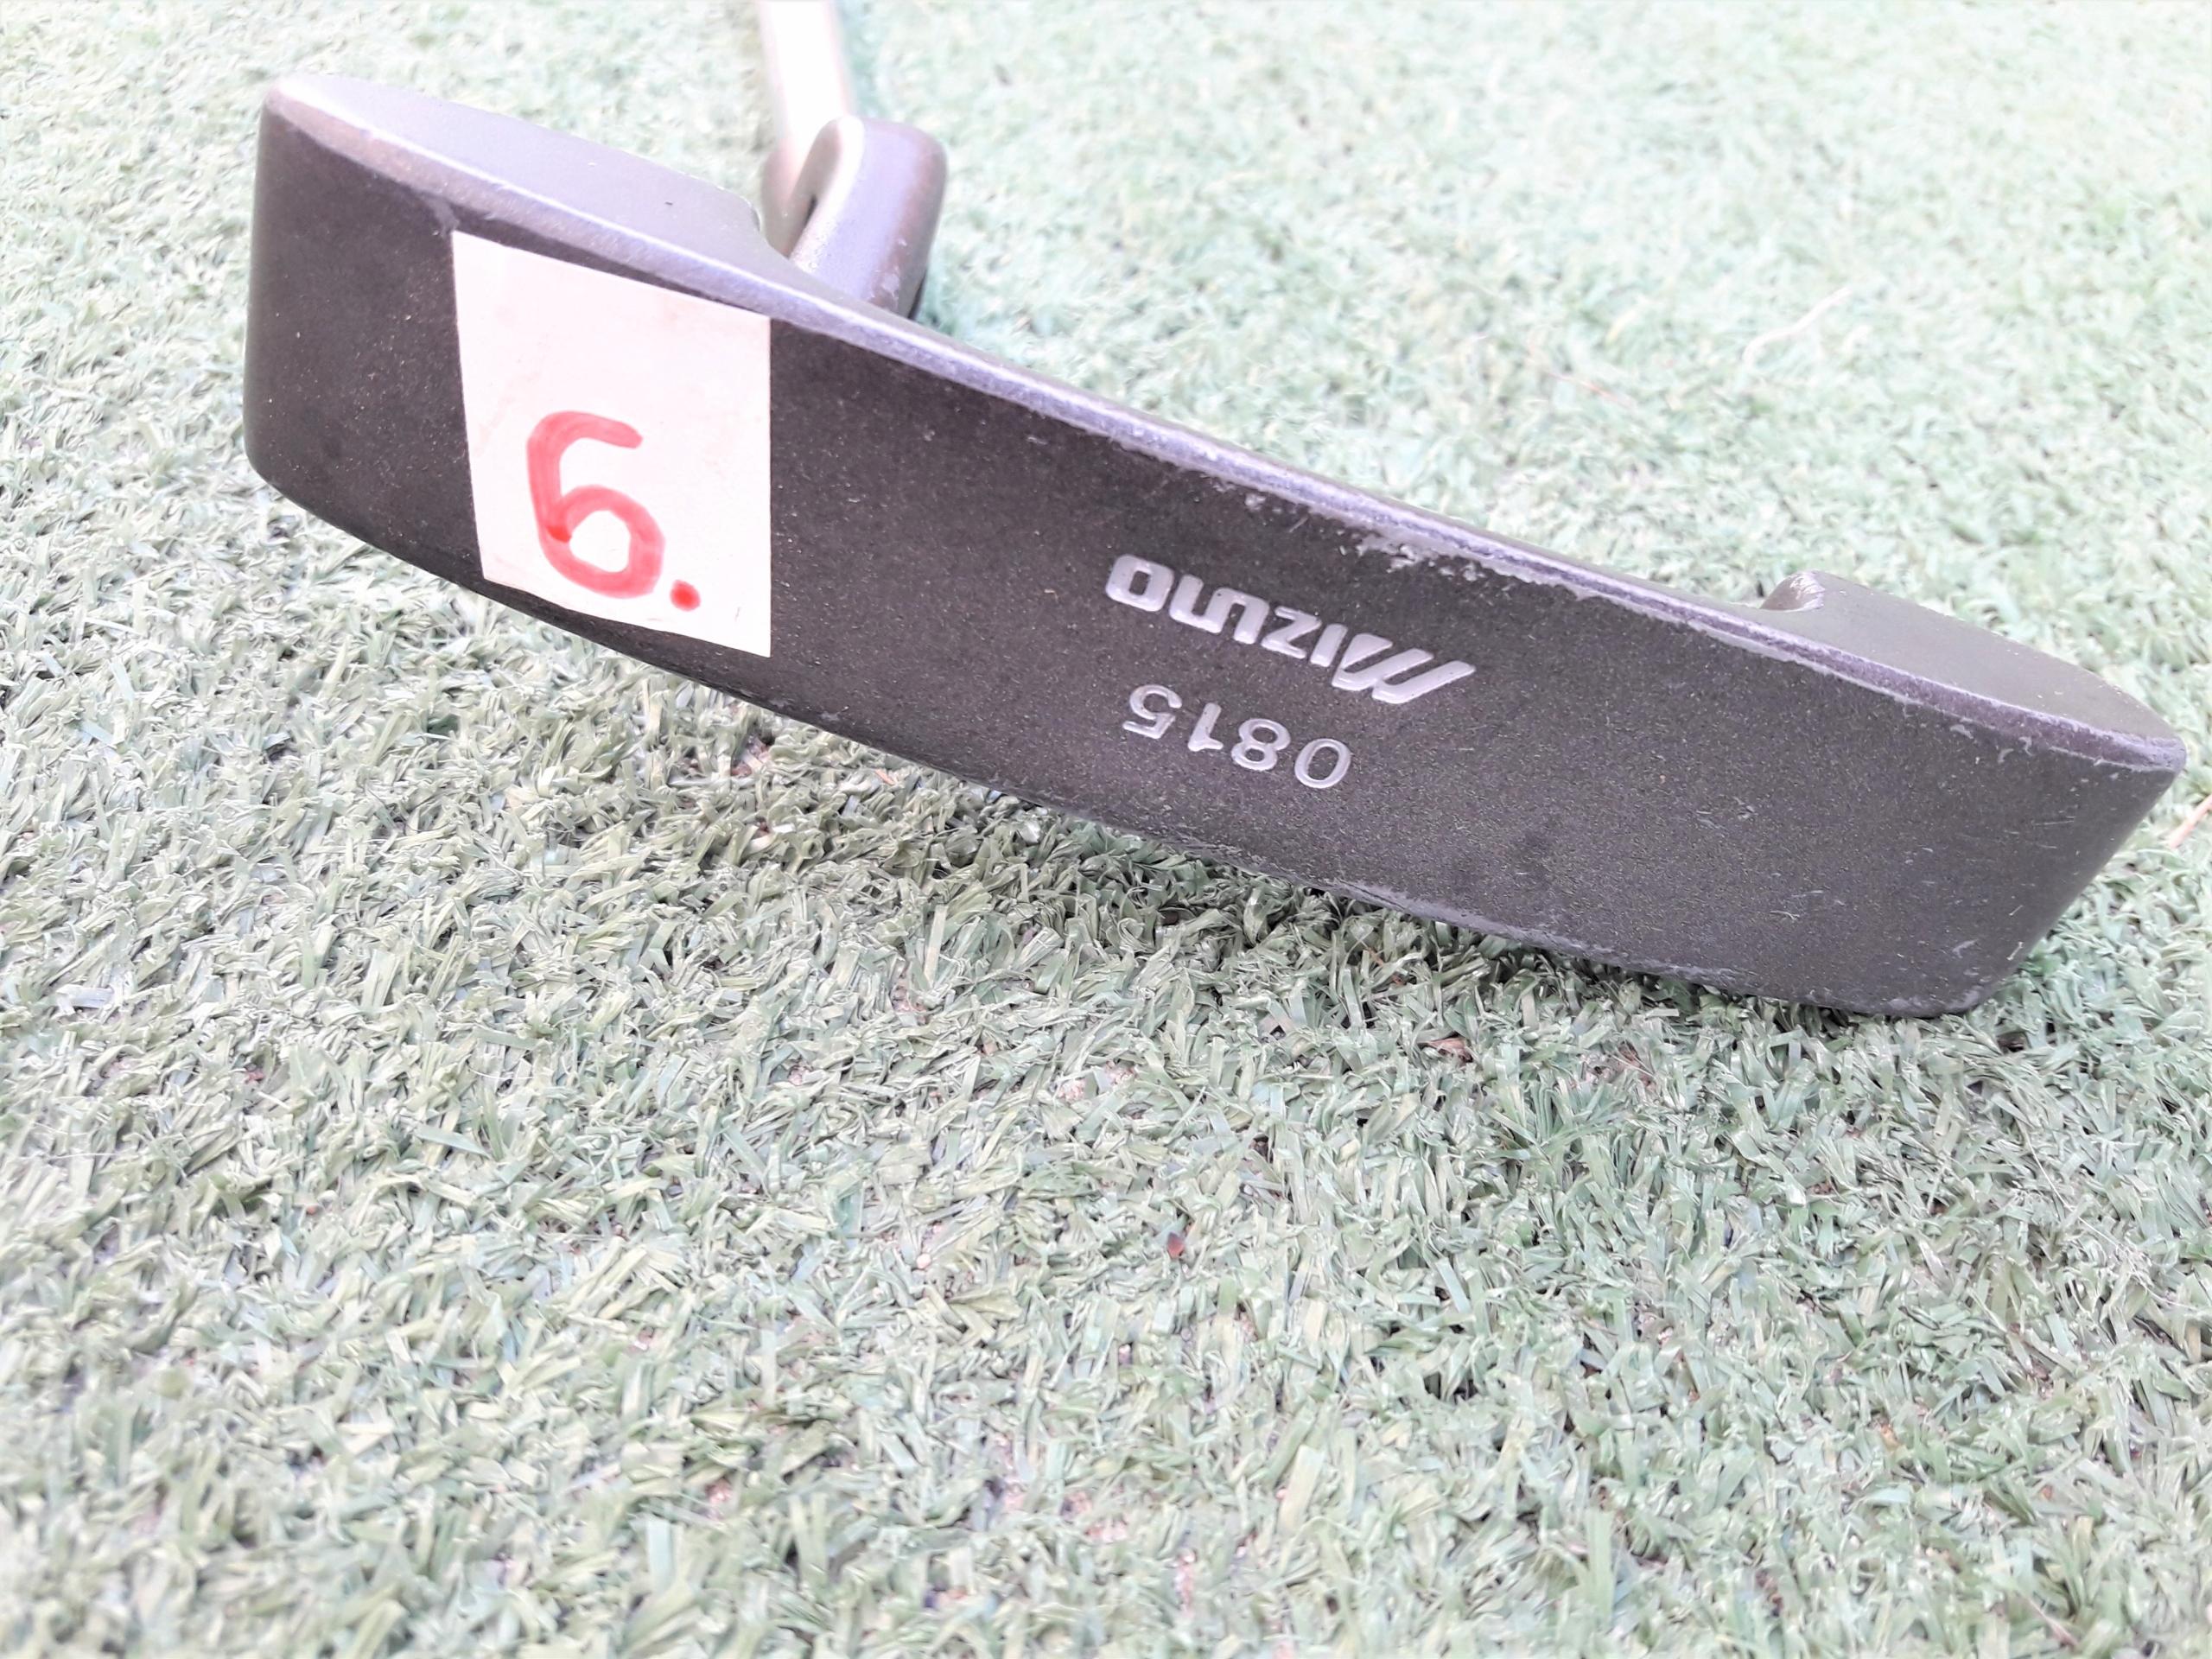 PUTTER kij golfowy MIZUNO 0815